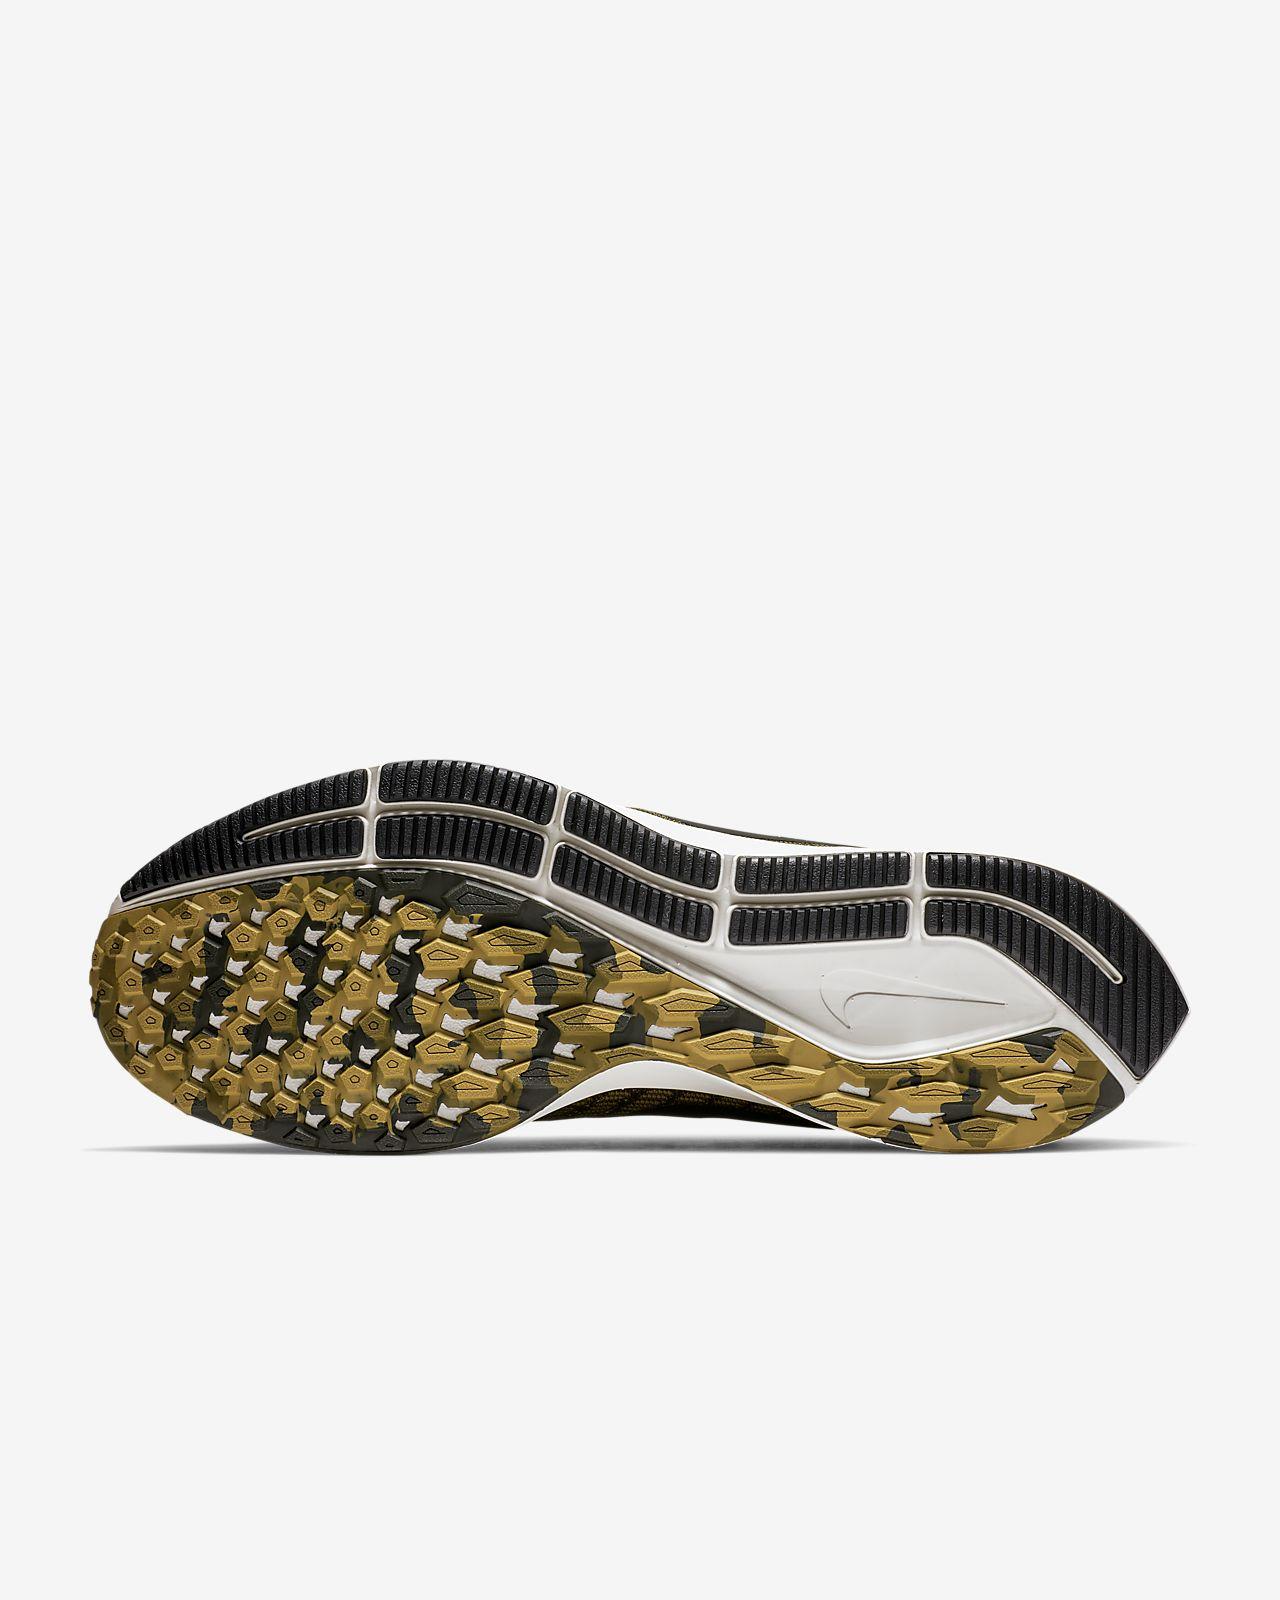 promo code 6b330 a3d65 ... Nike Air Zoom Pegasus 35 Men s Camo Running Shoe